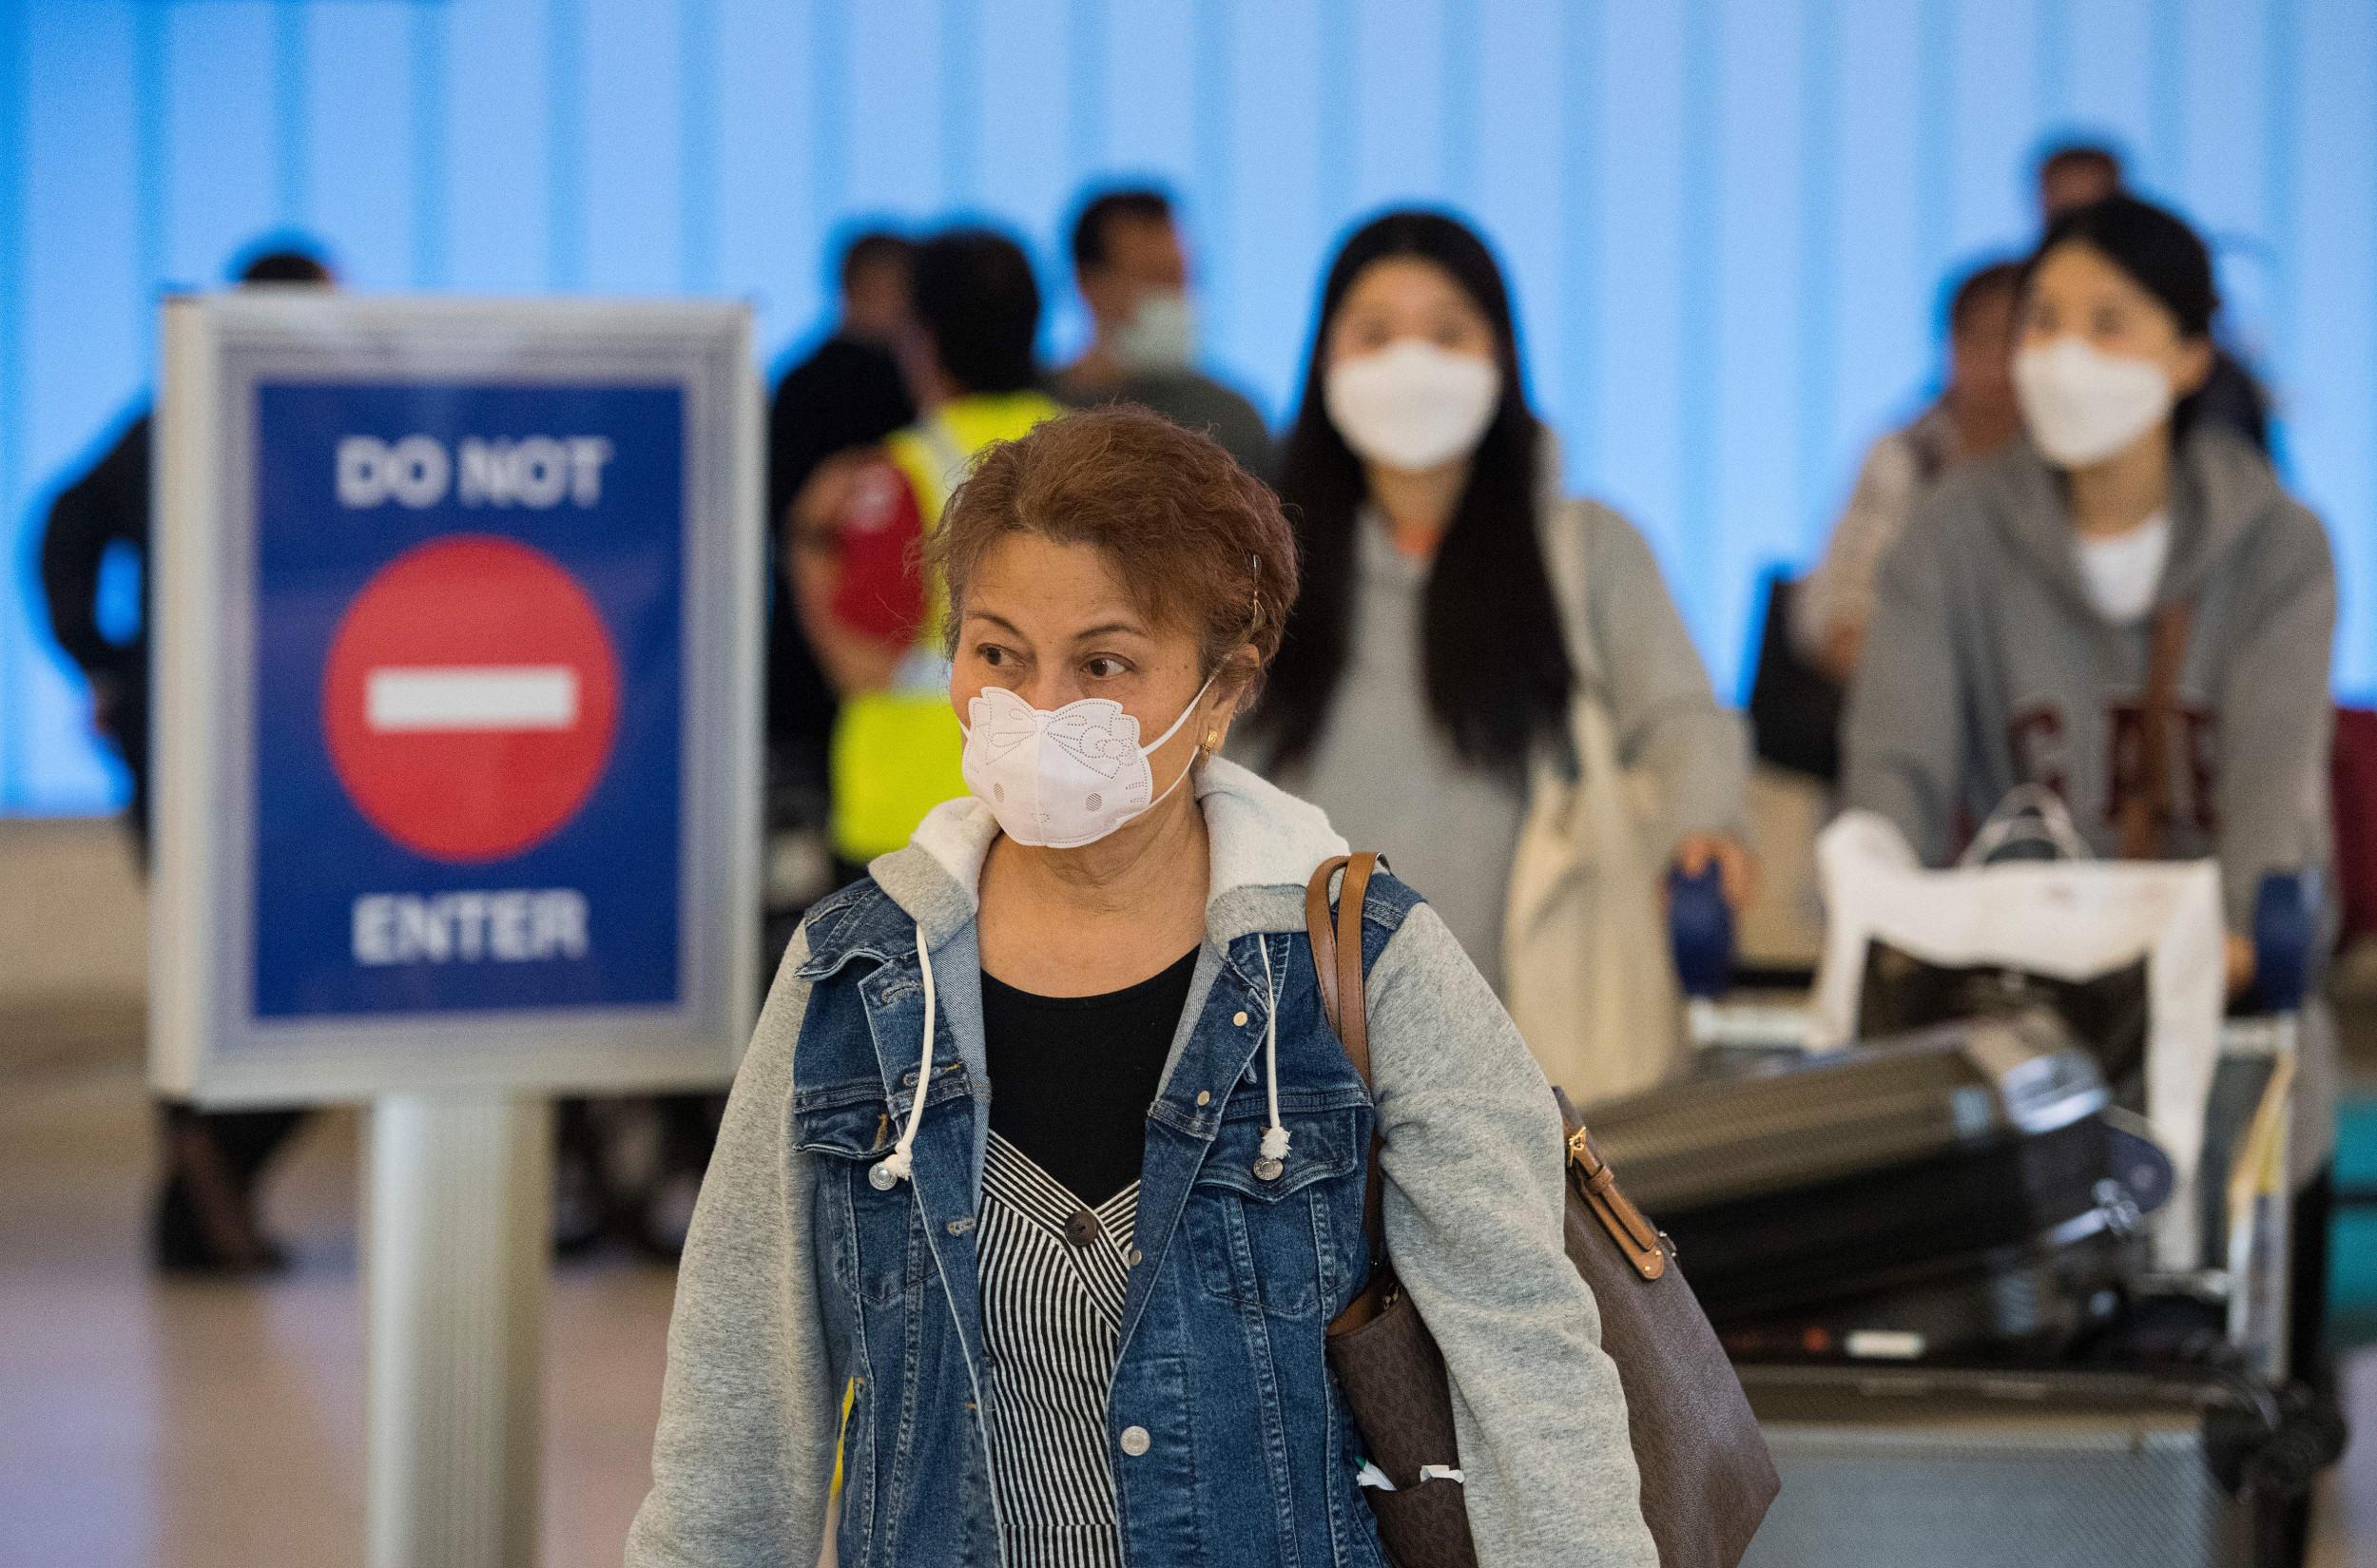 Coronavirus U.S. Outbreak Update as Dozens of New Cases Confirmed ...